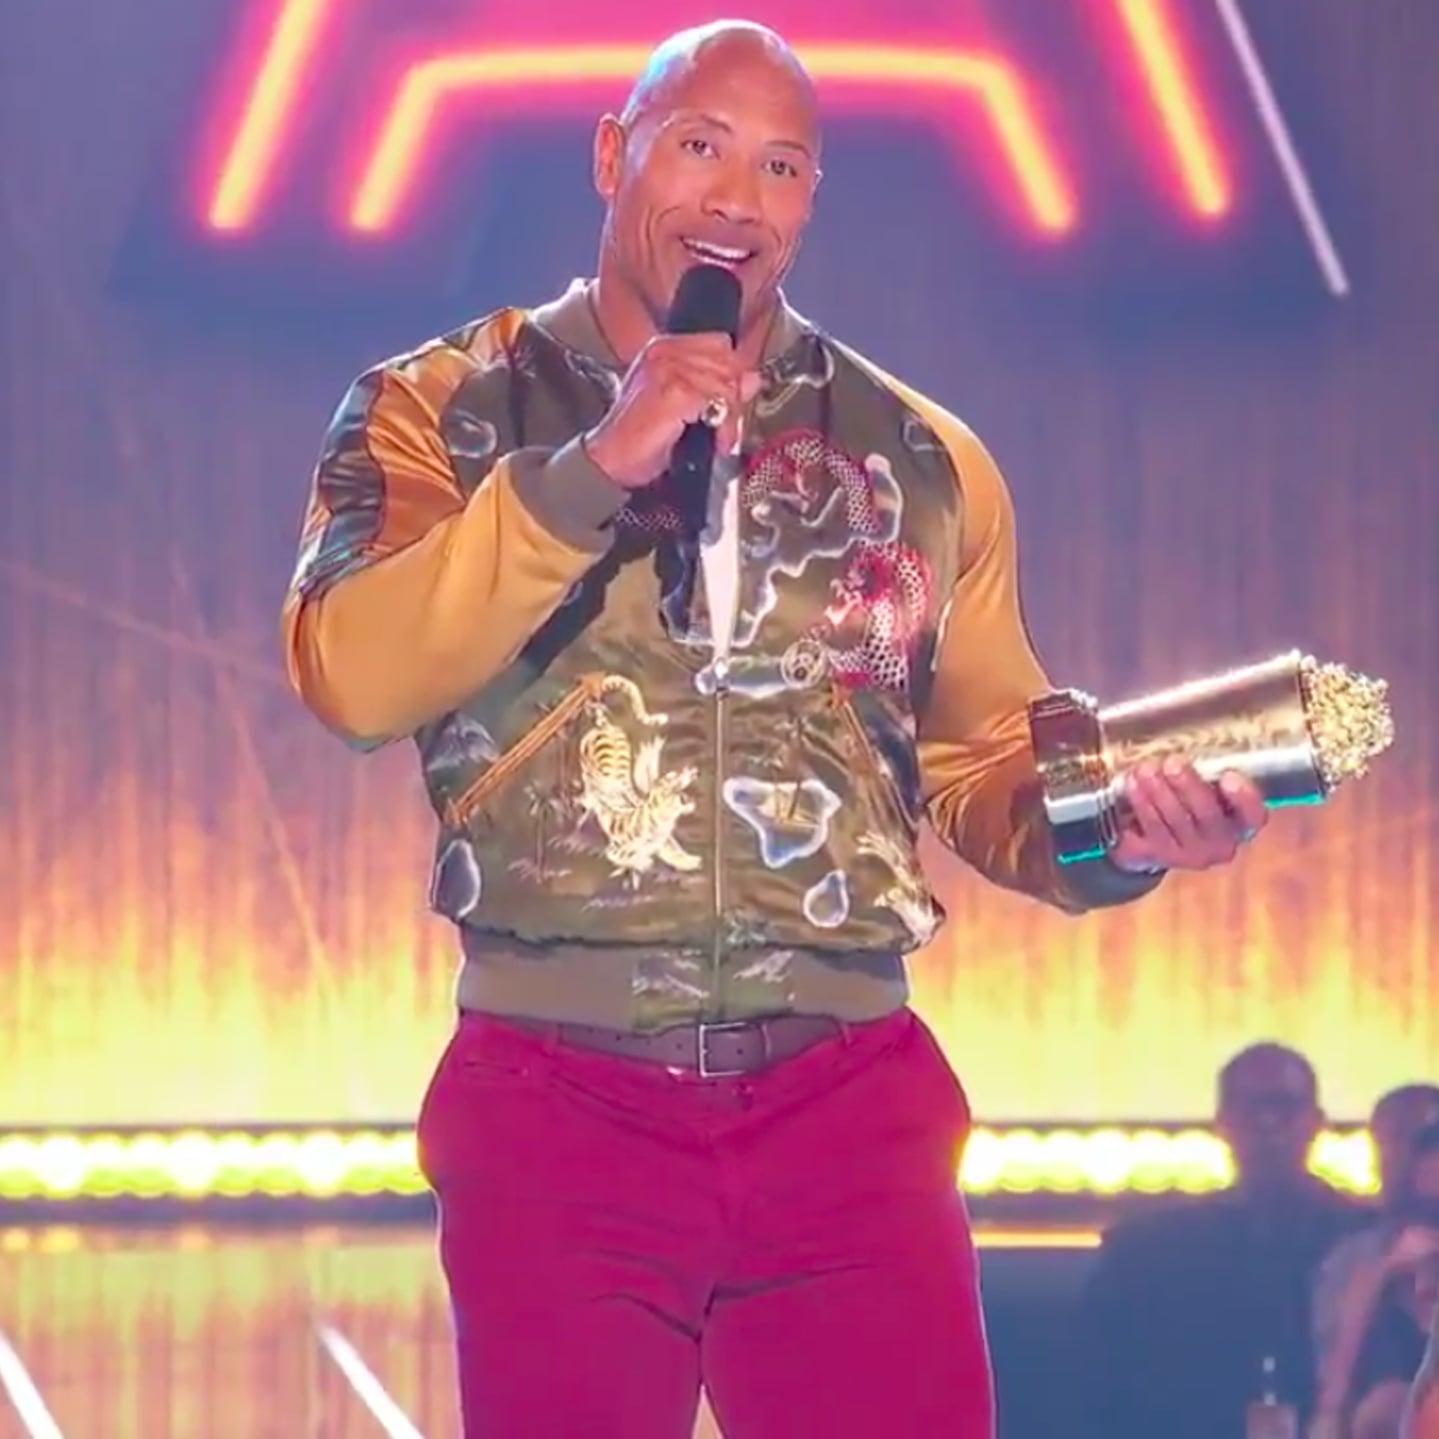 Dwayne Johnson's Acceptance Speech at 2019 MTV Awards Video